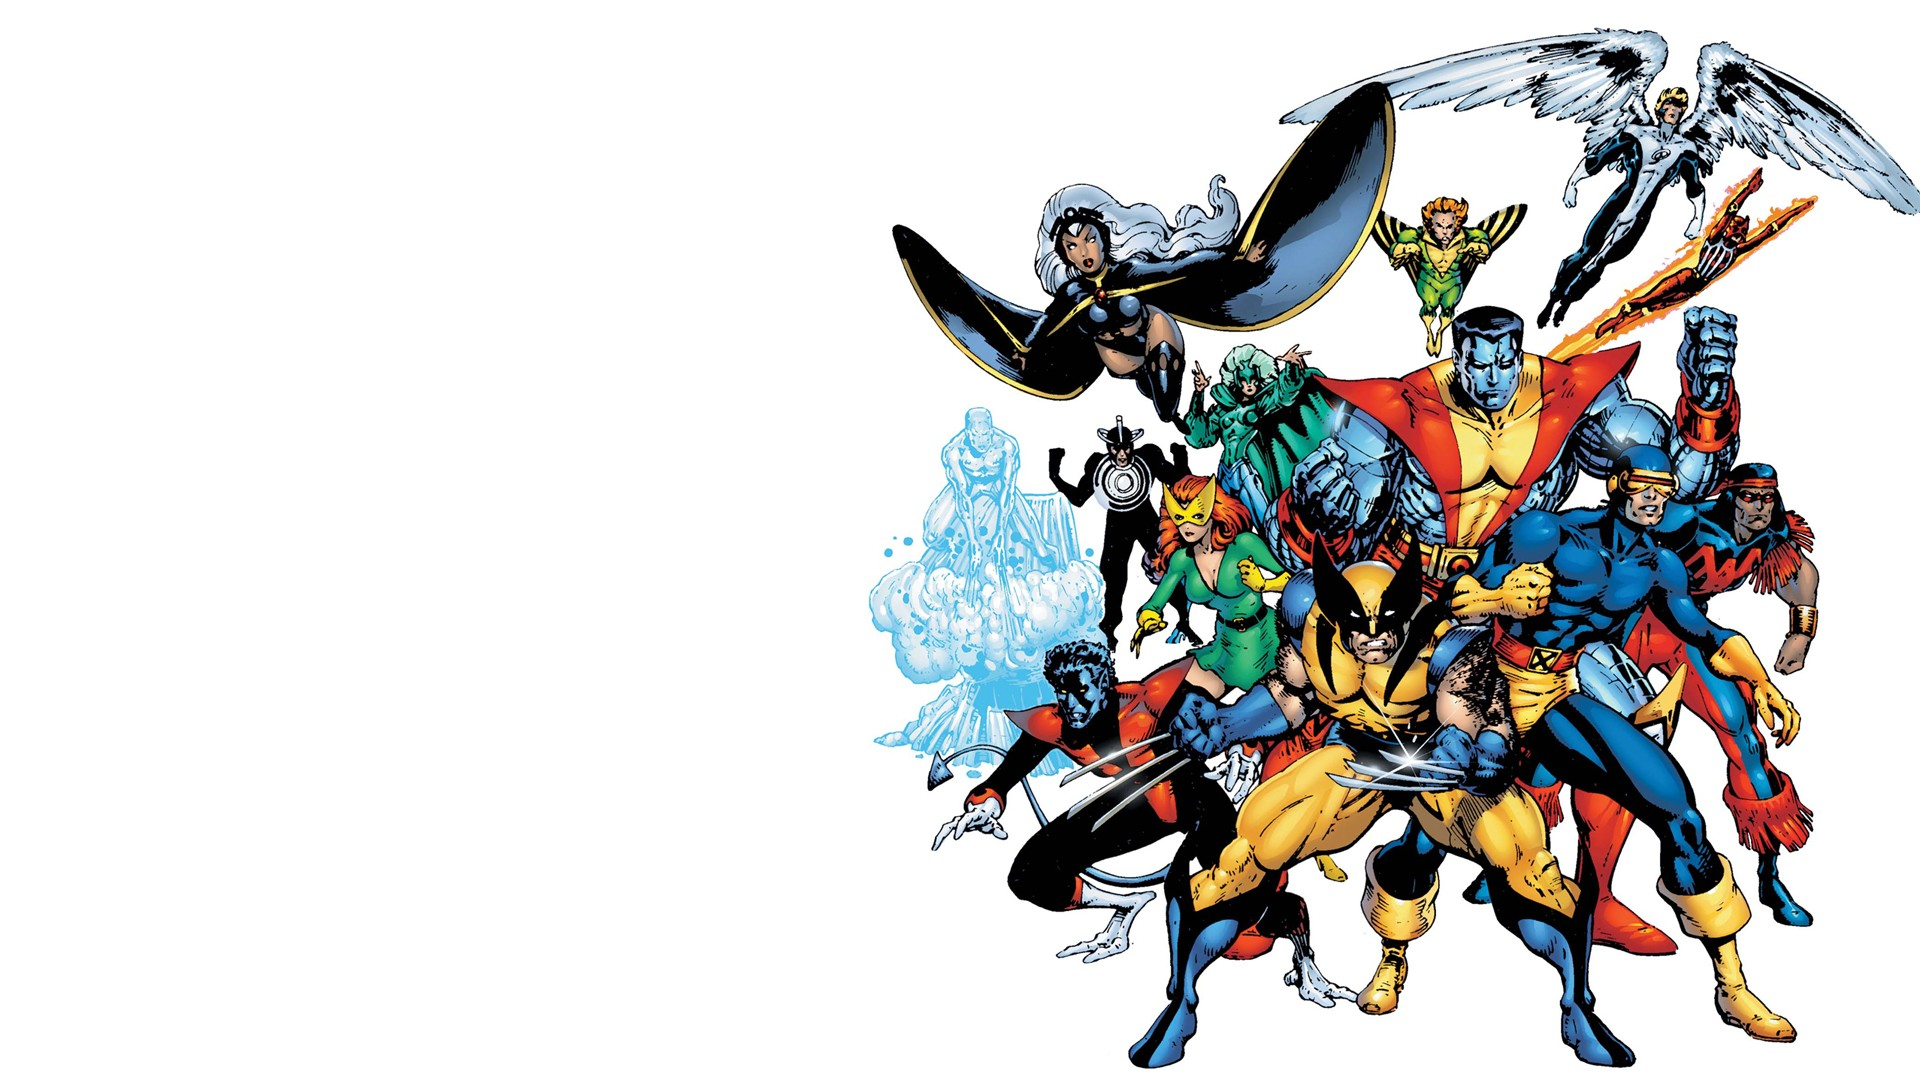 Comics   X Men Storm Cyclops Wolverine Nightcrawler Wallpaper 1920x1080